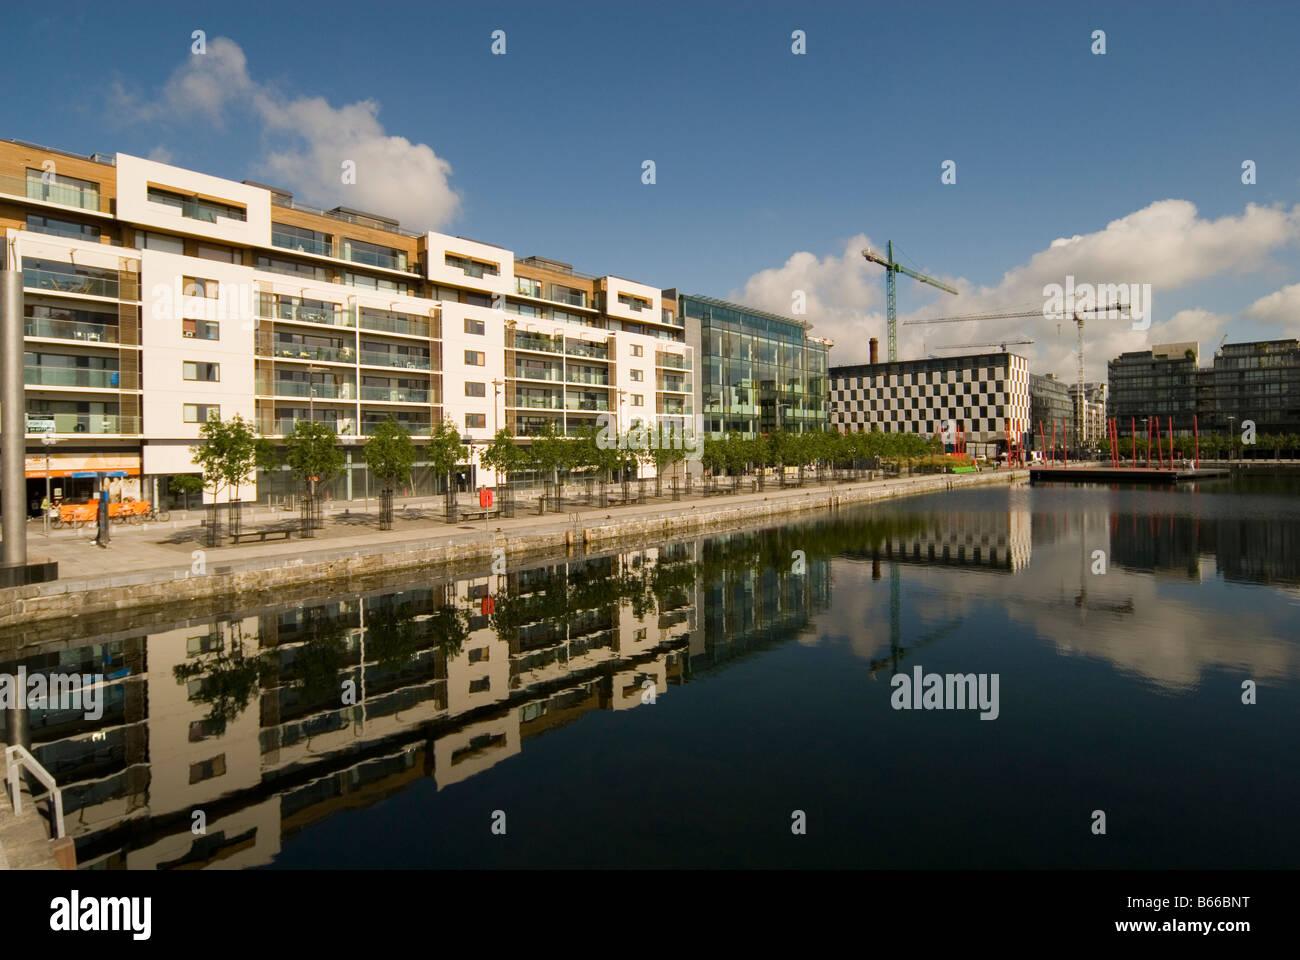 Dublin Docklands, Ireland Stock Photo